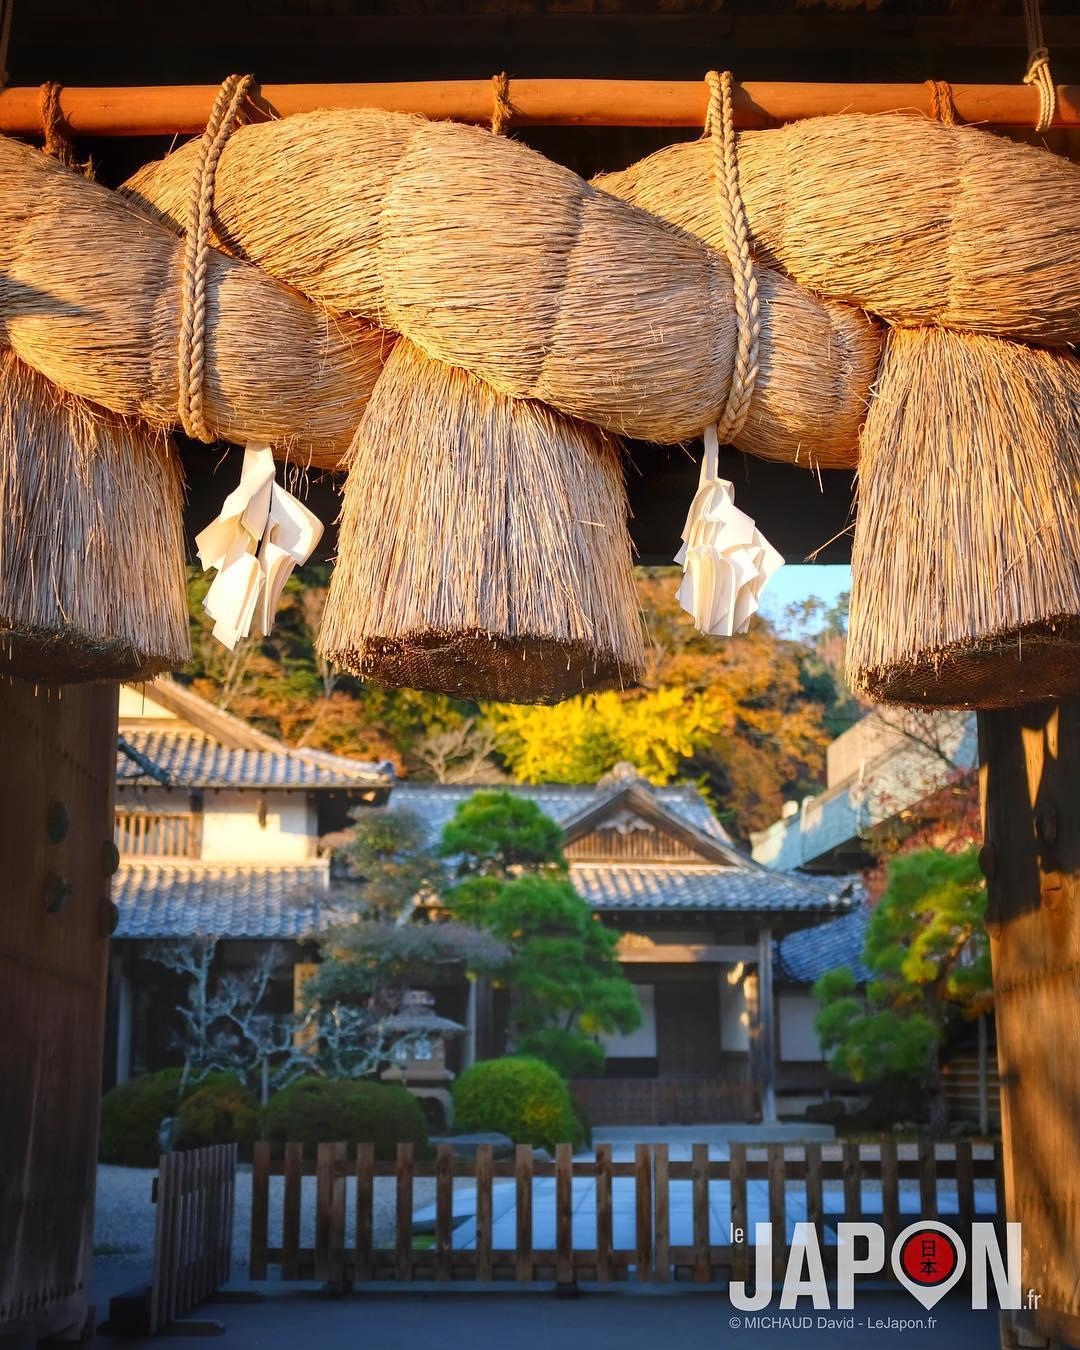 Derrière la porte du sanctuaire Izumo Taisha ! ⛩😲 #IzumoAdventures #Izumo #fujix100f